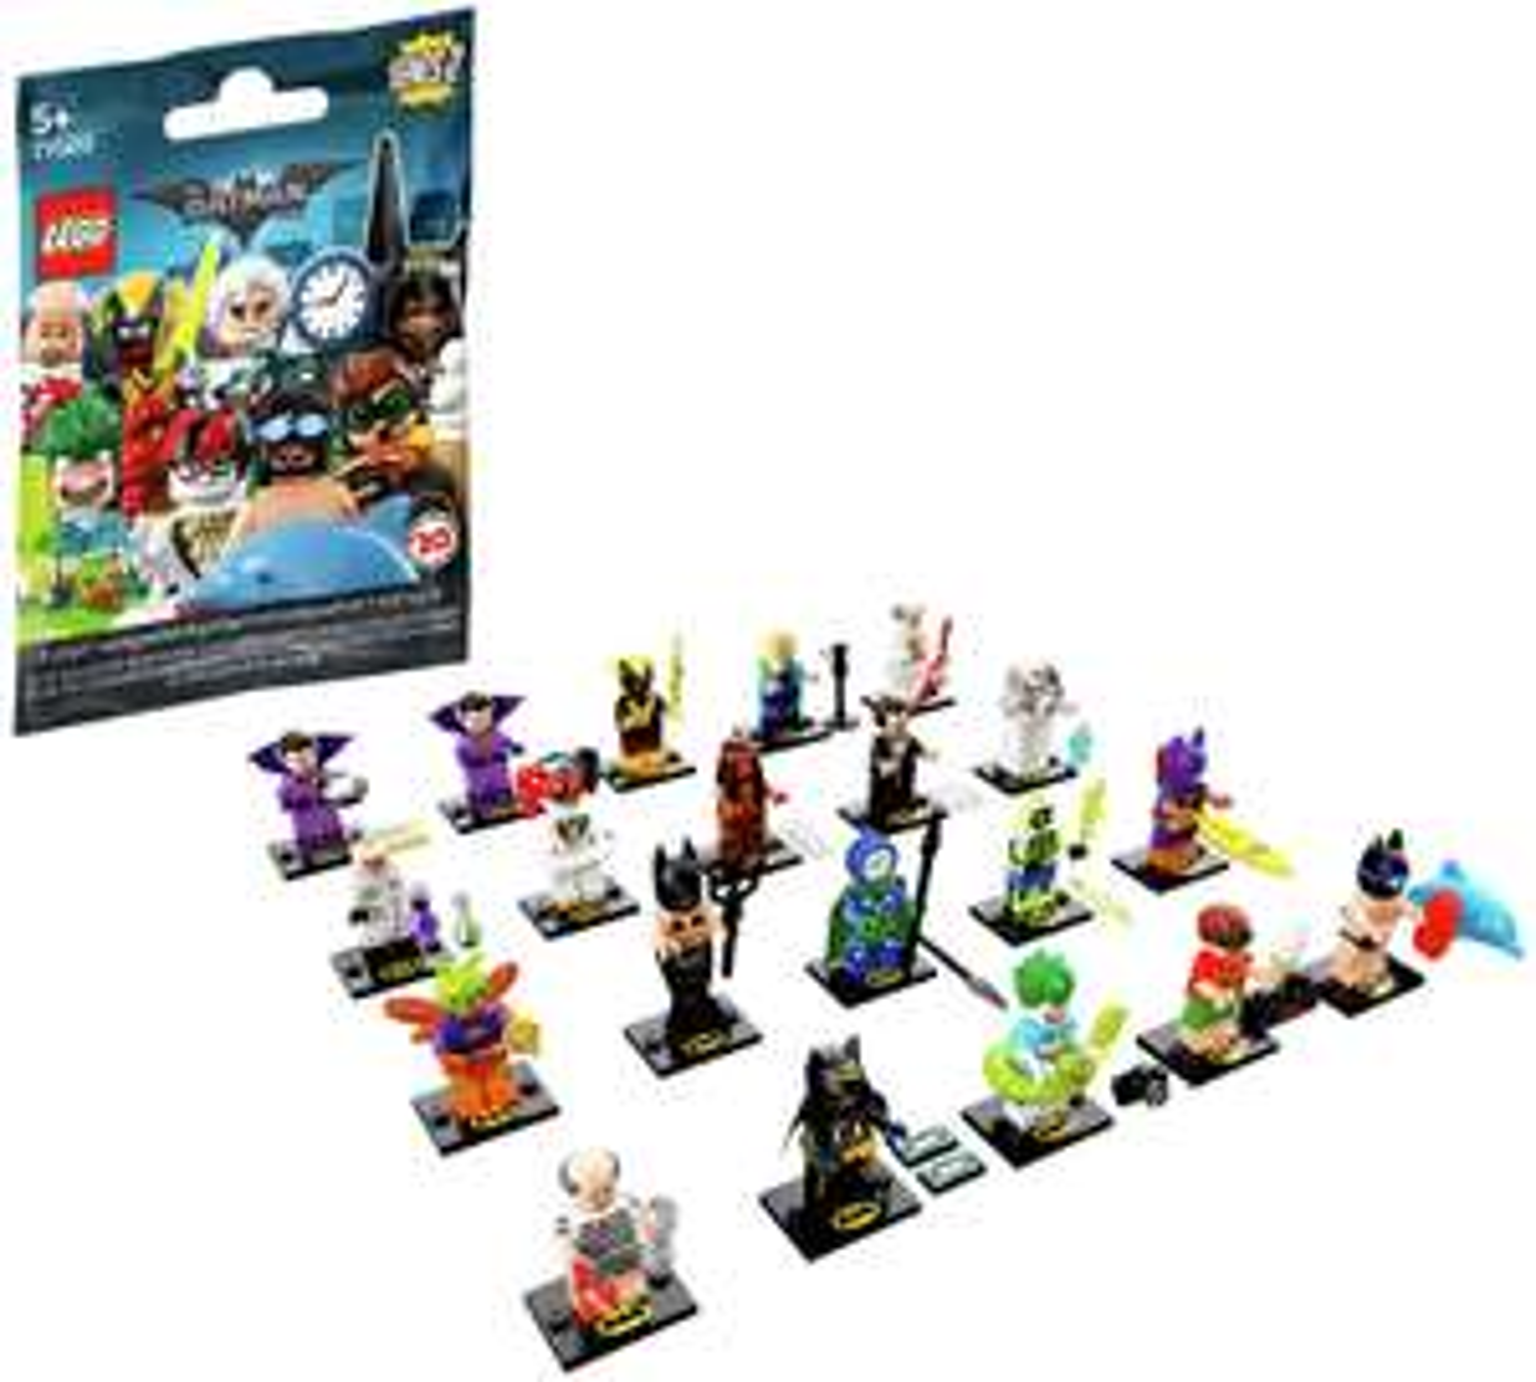 LEGO Minifigures The Batman Movie Series 2 - 71020 - £1.49 @ Argos (Free C&C)